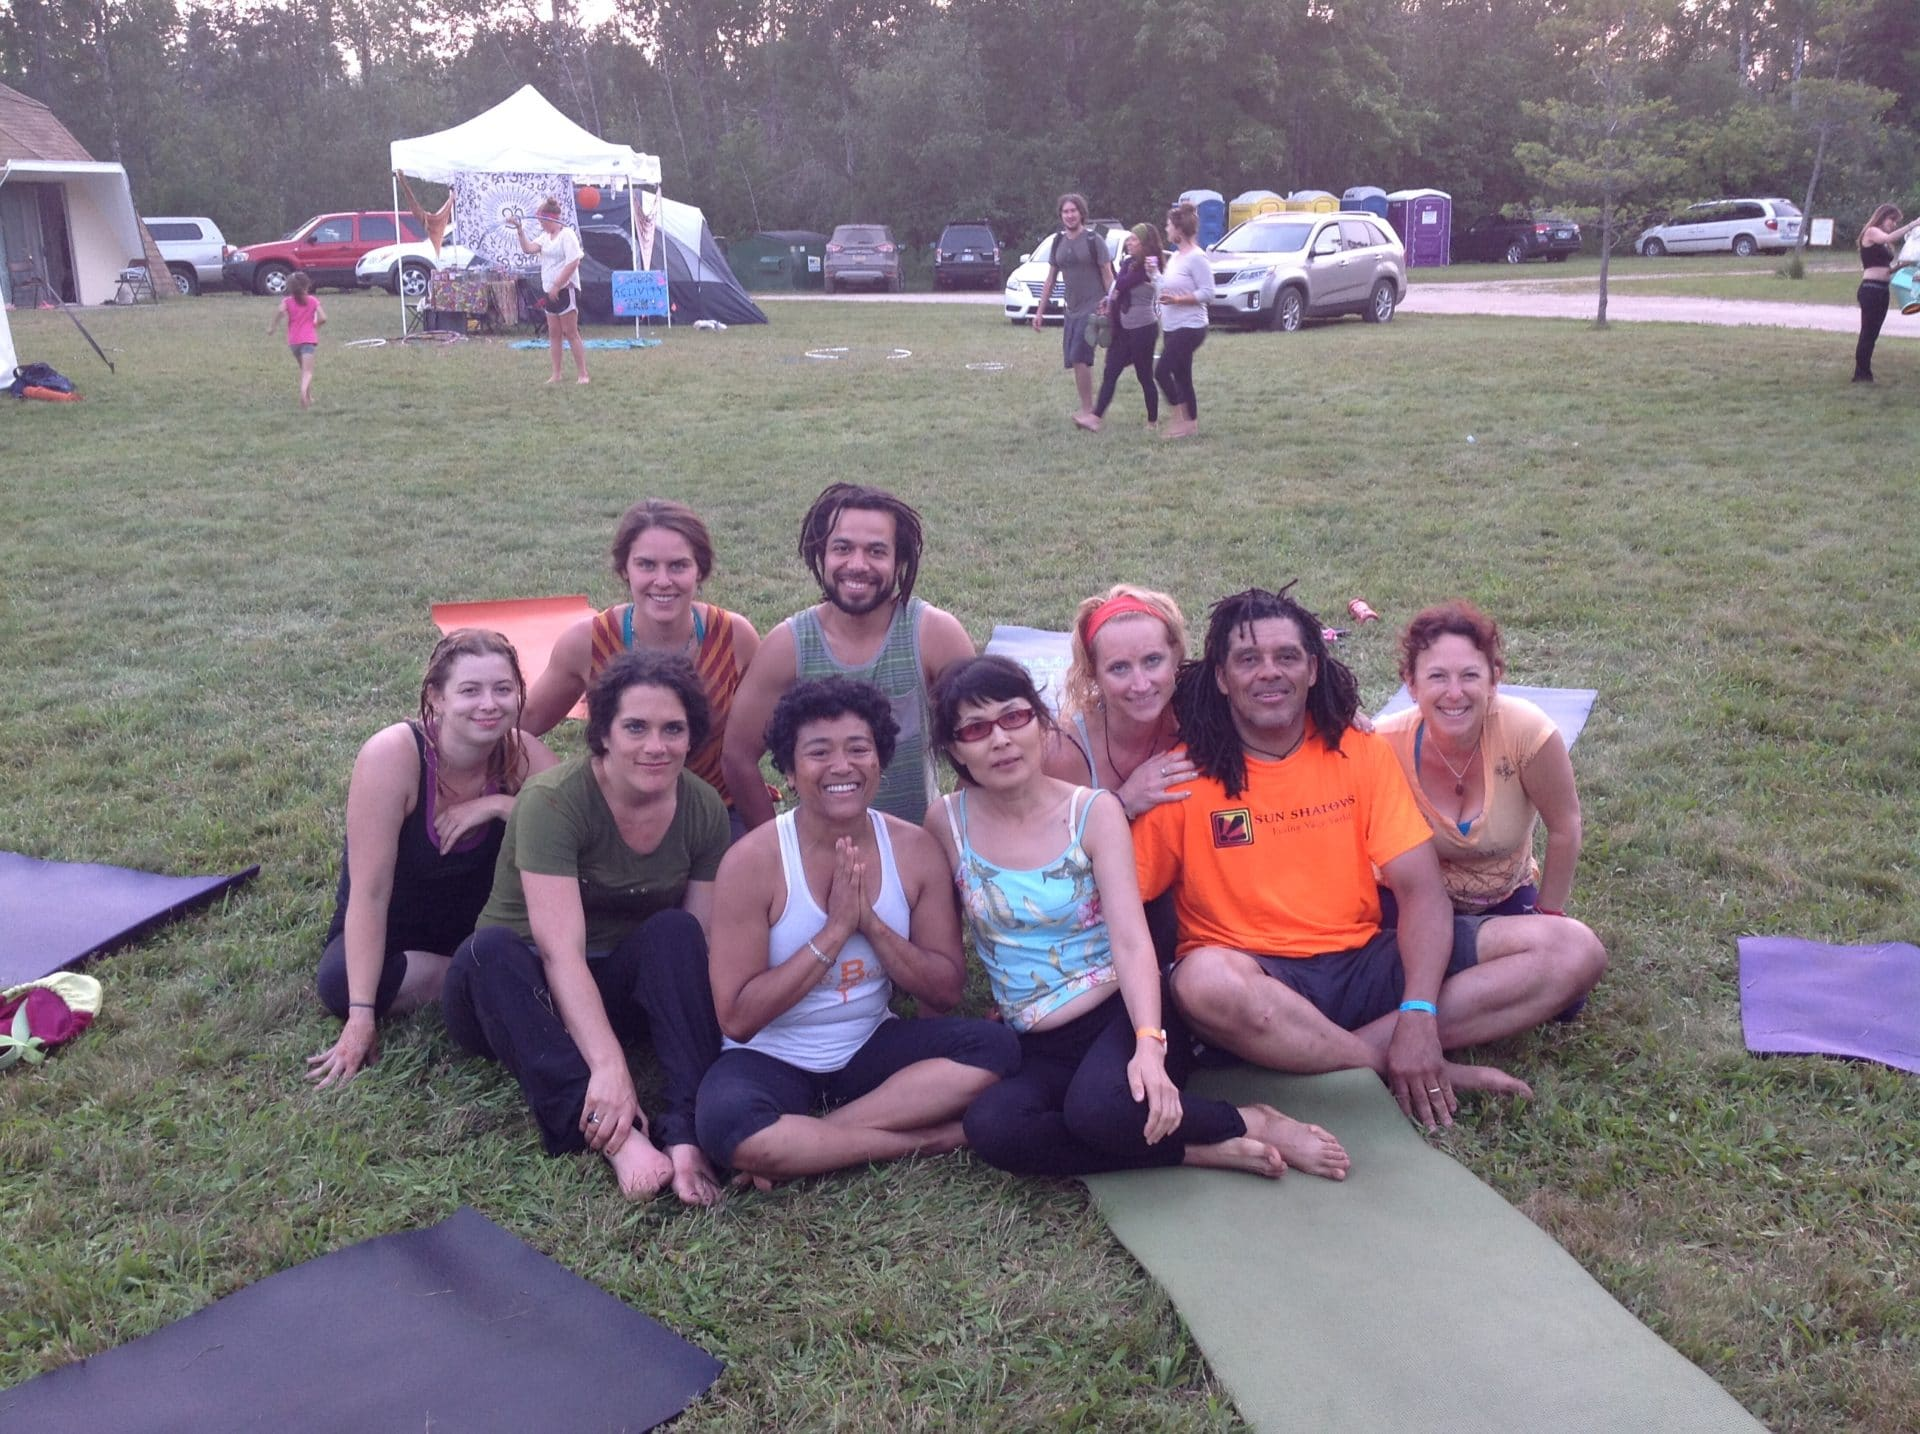 Community and yoga at Michigan Yoga Fest